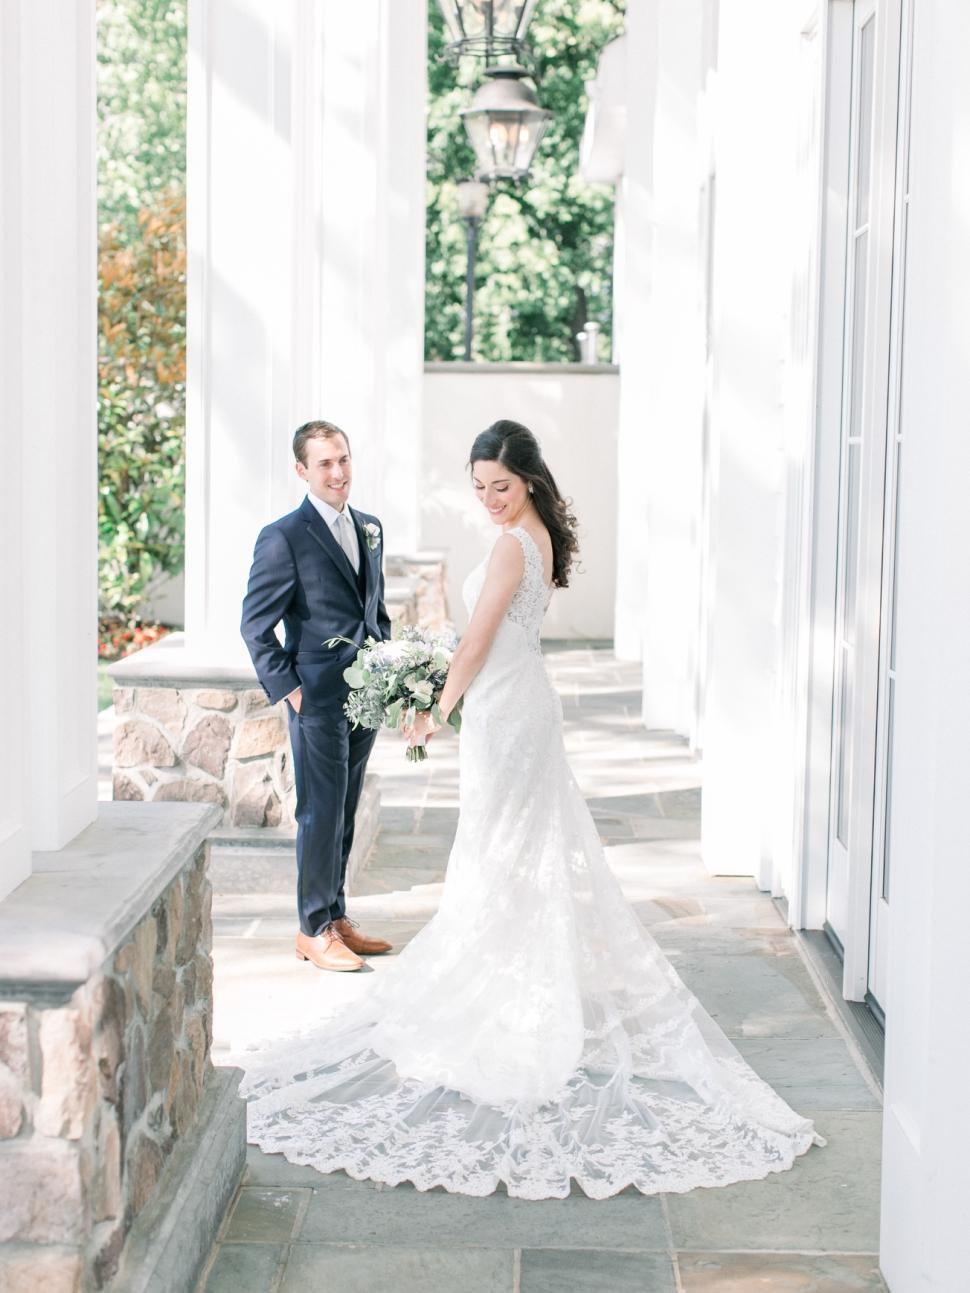 Ryland-Inn-Wedding-Photographer-Cassi-Claire_Ryland-Inn-Wedding_16.jpg